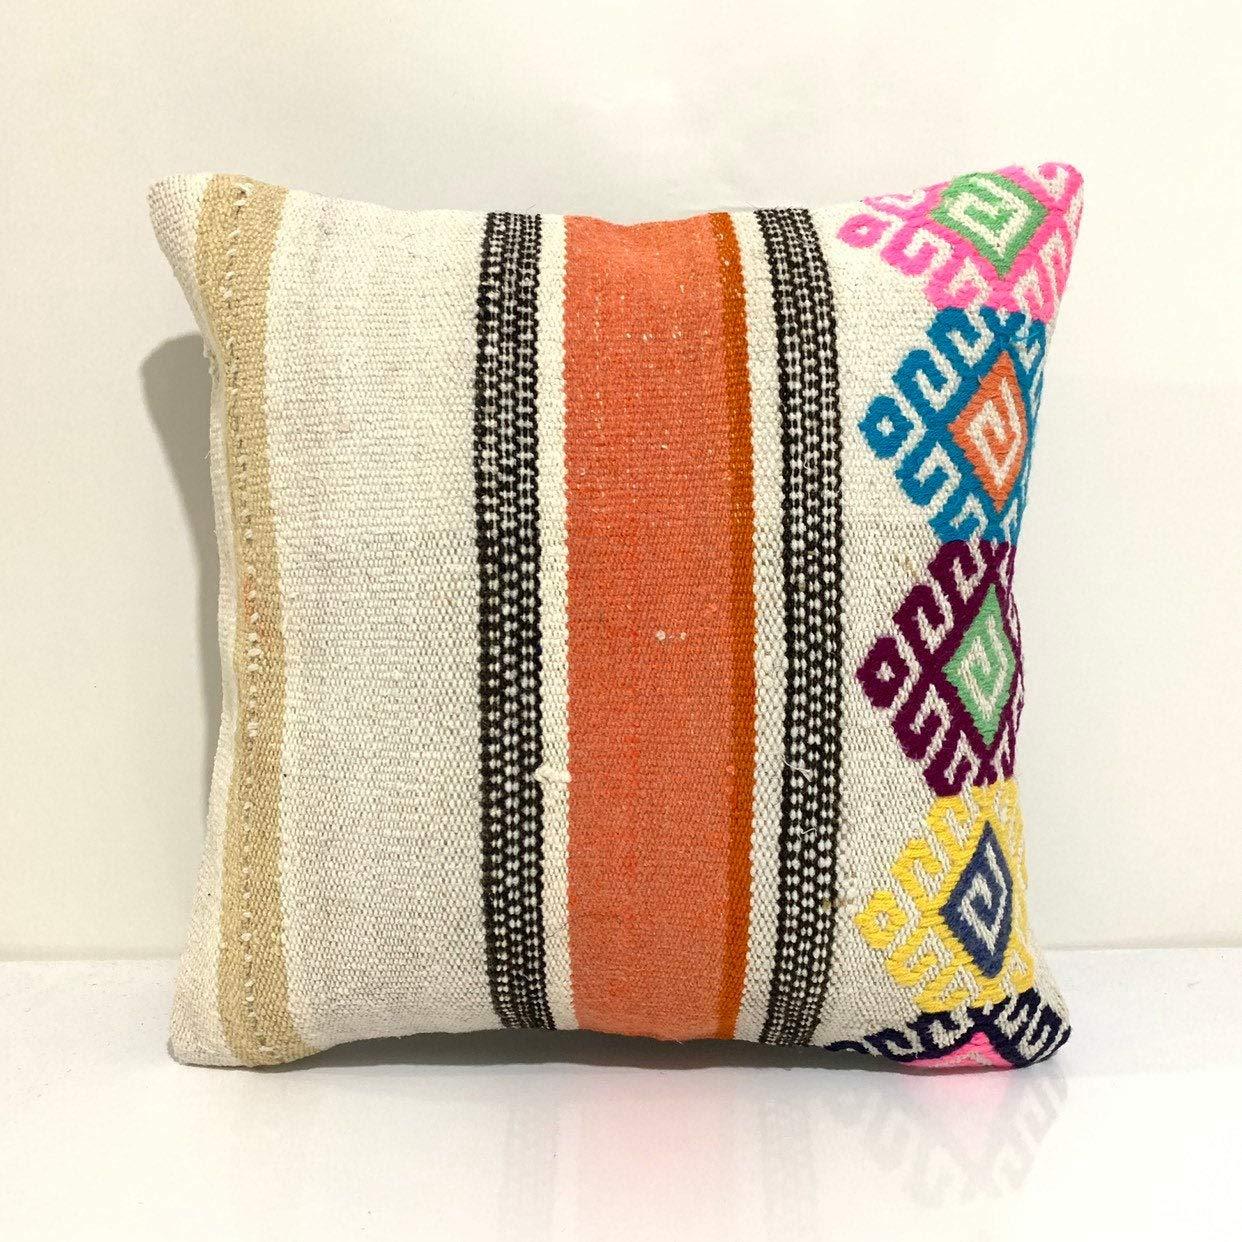 Custom It is very popular Kilim Pillow Cover 16x16-Decorative Topics on TV Pillow-Unique Home De